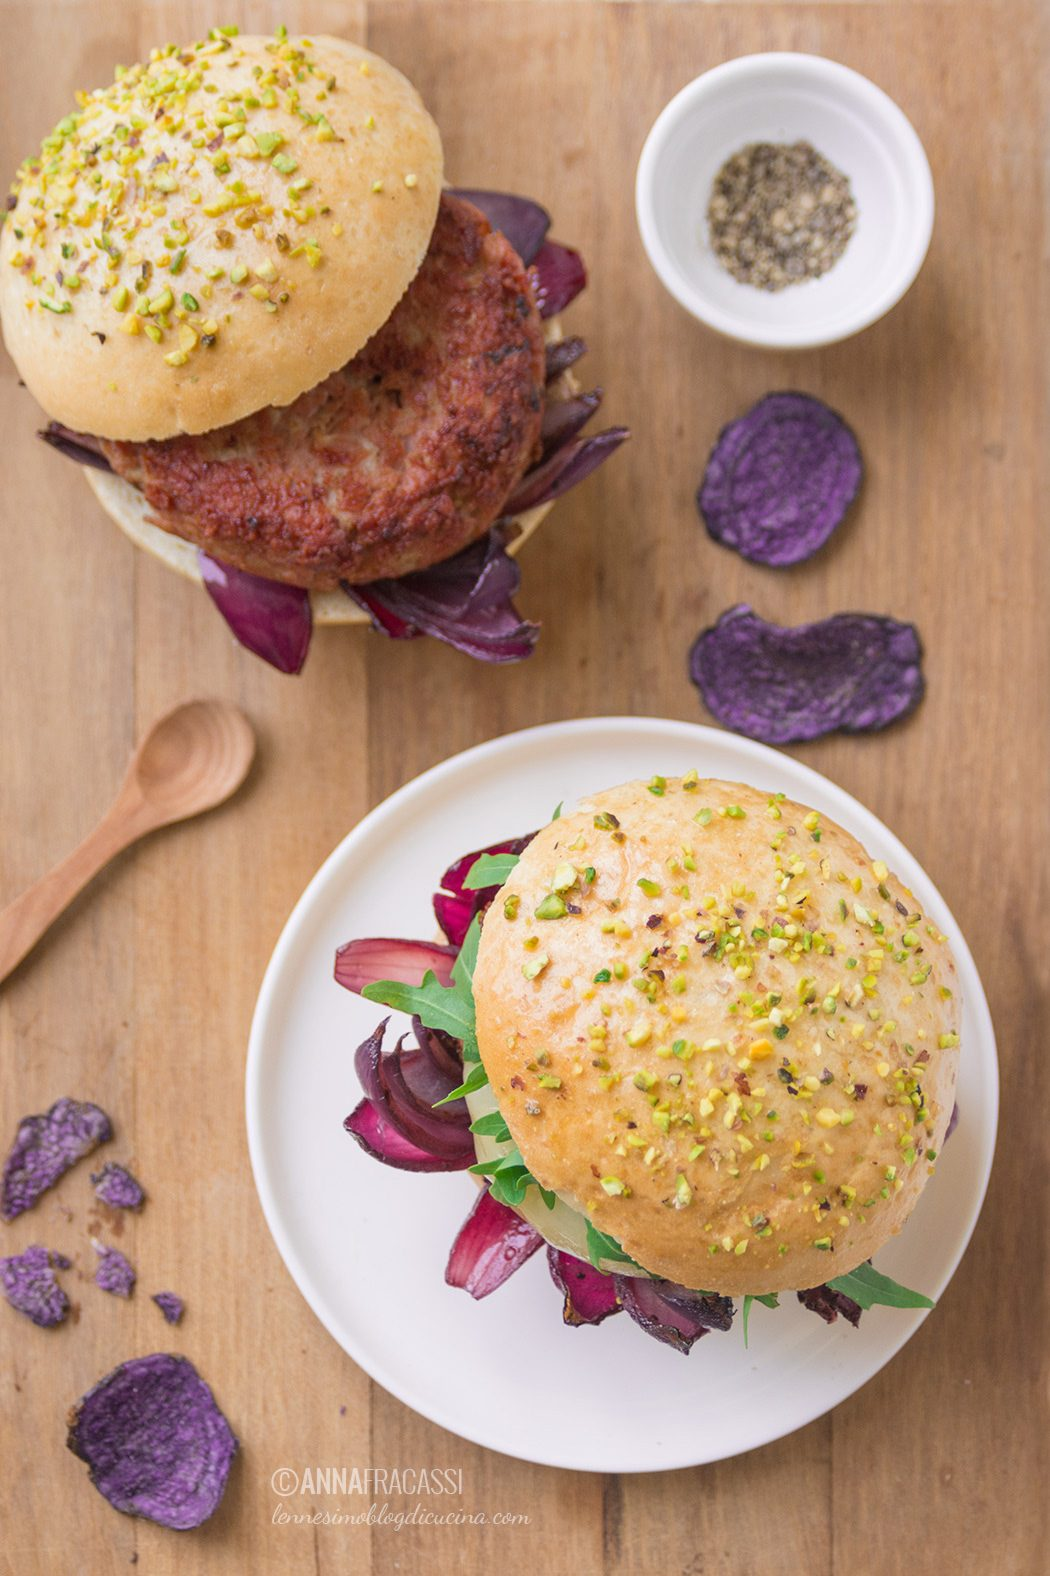 Mortadella burger con cipolle caramellate e provola filante